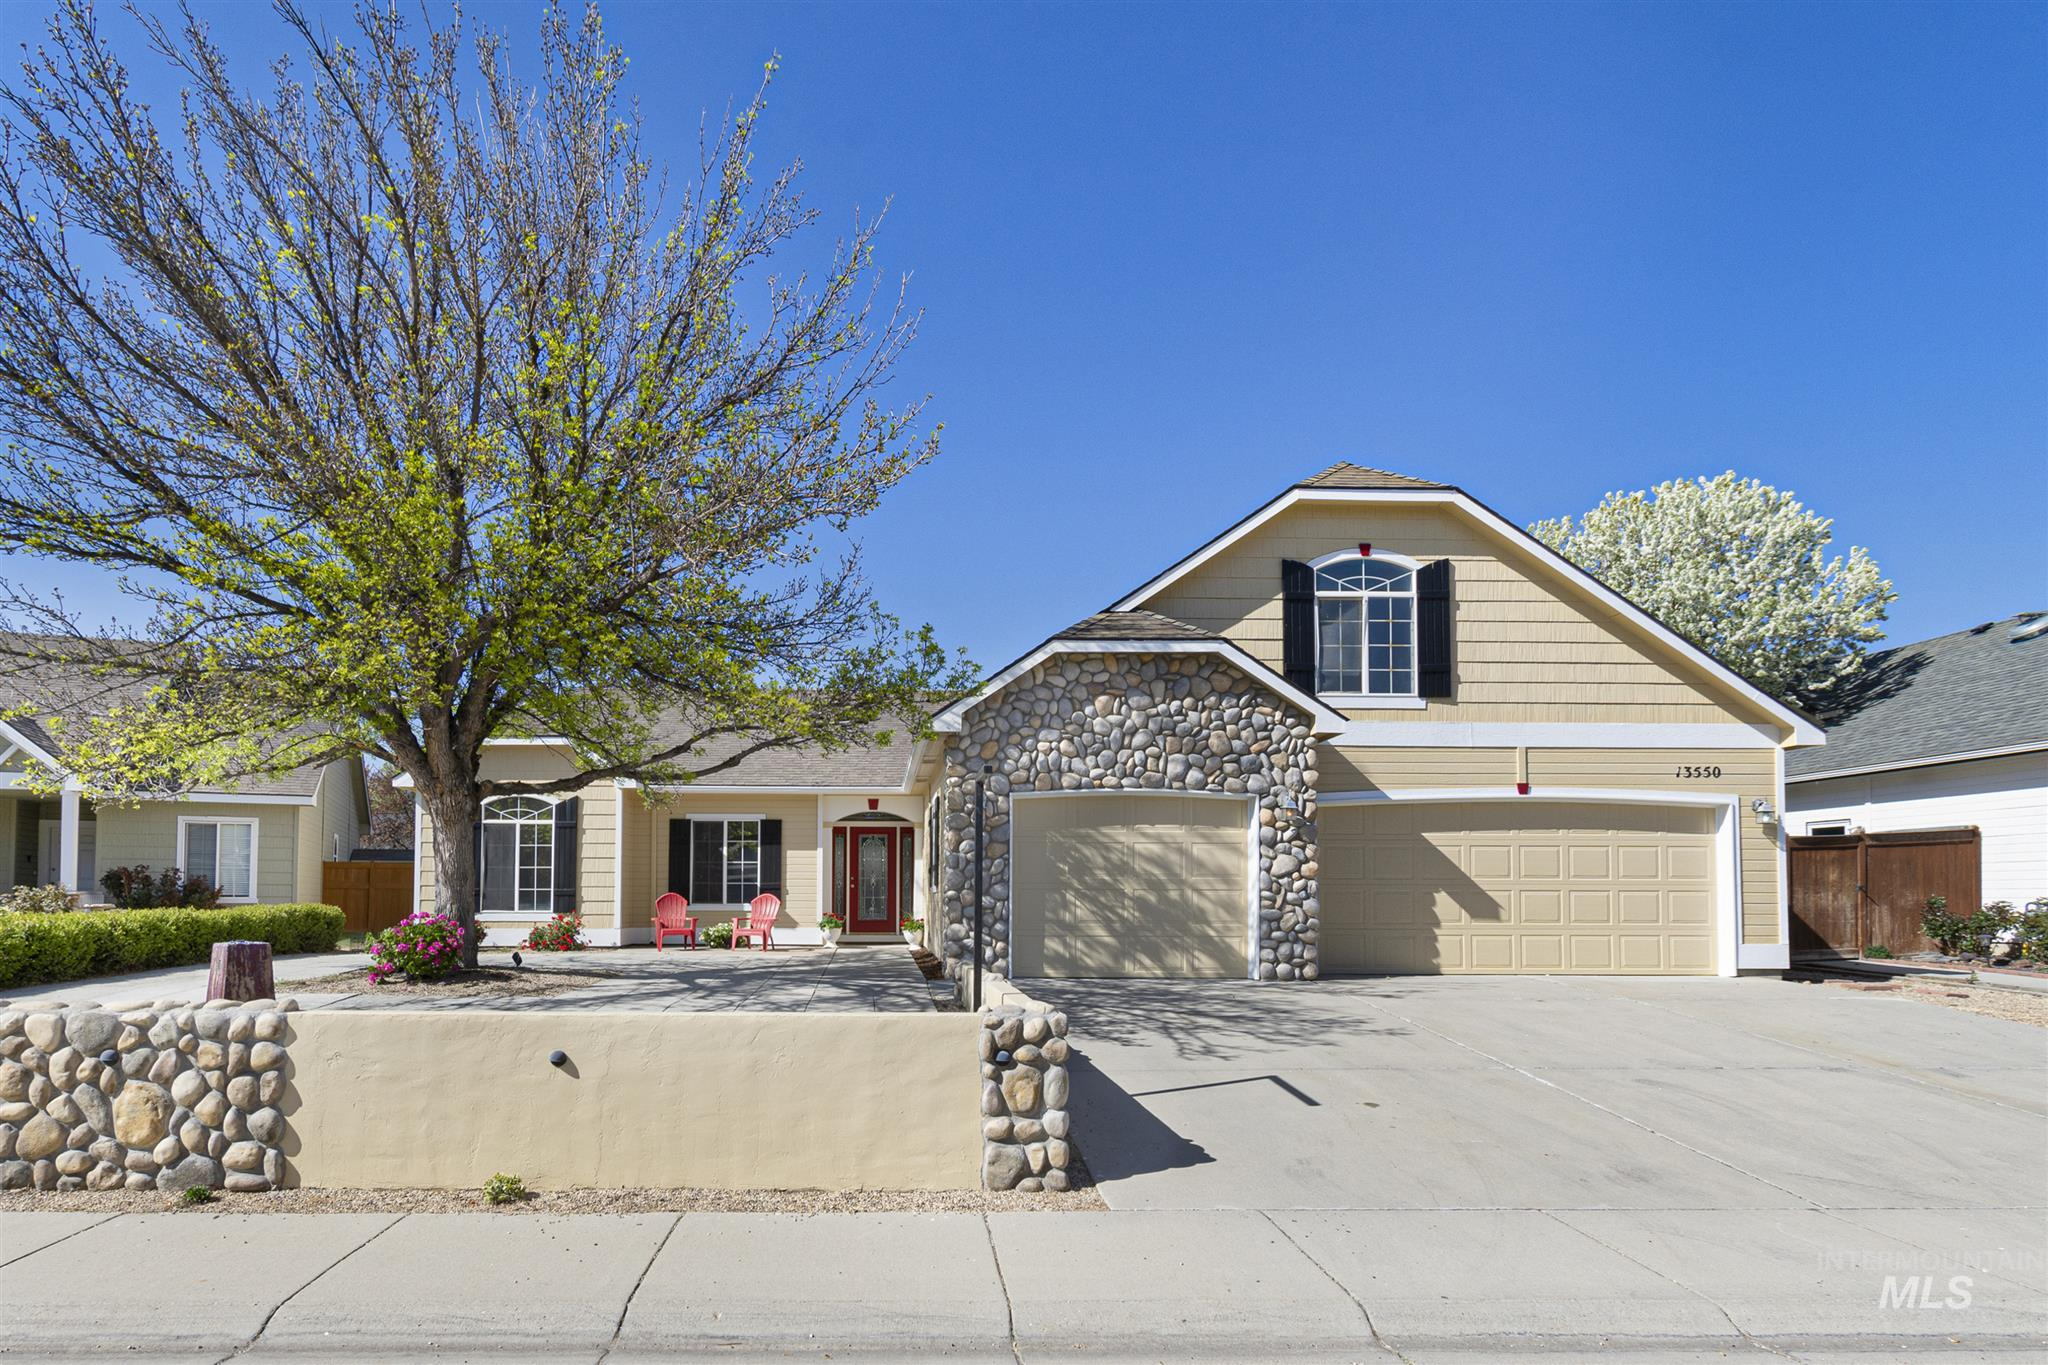 13550 W Waldemar Property Photo - Boise, ID real estate listing